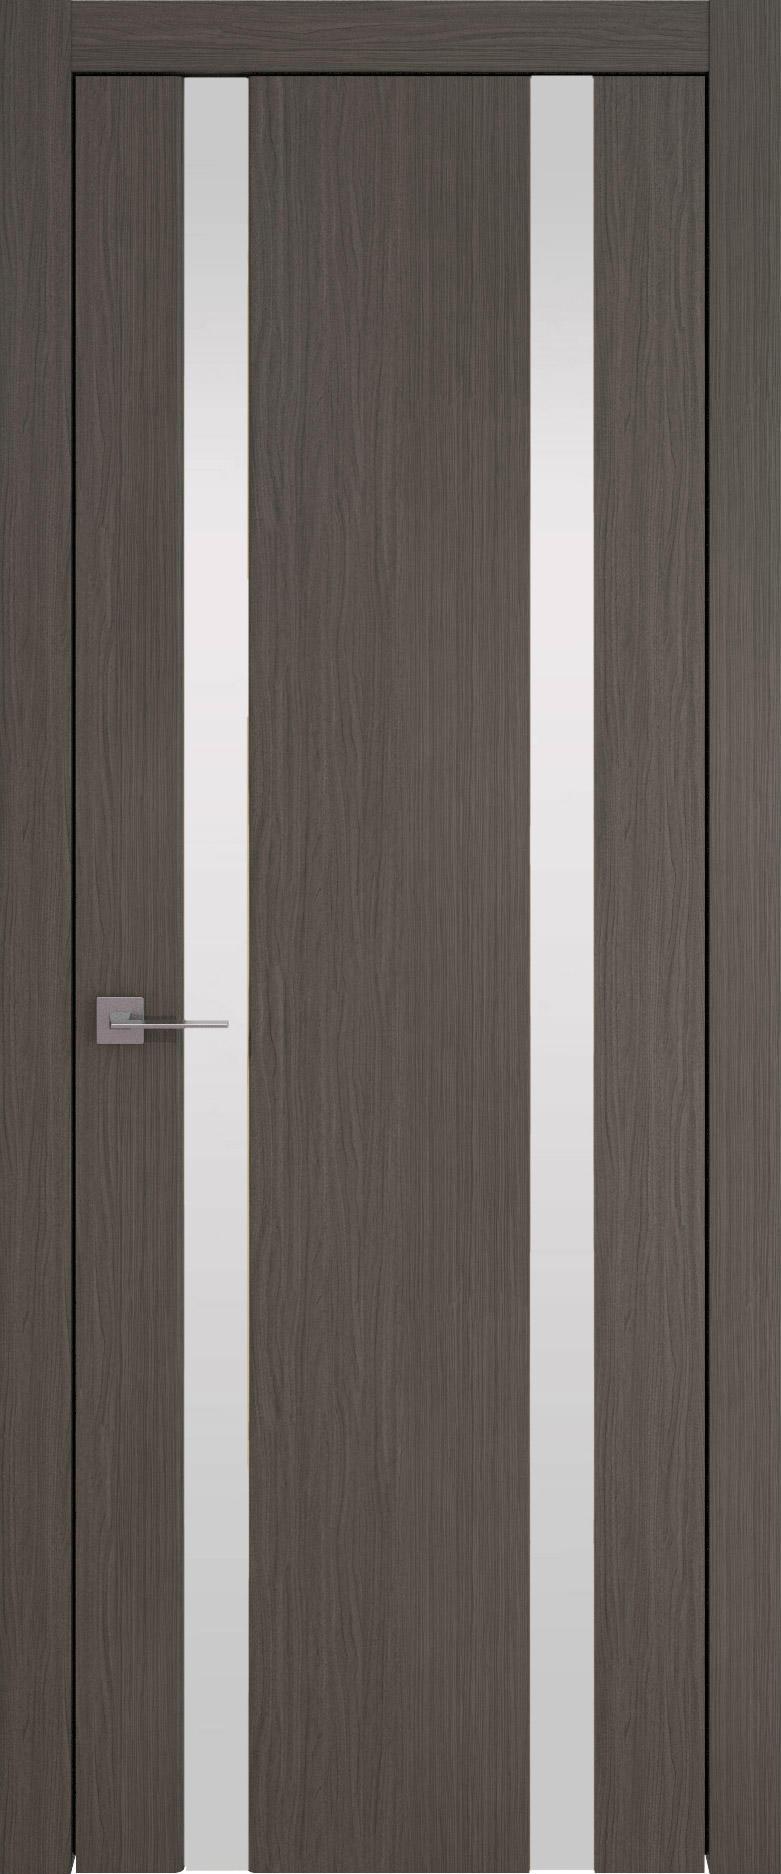 Torino цвет - Дуб графит Без стекла (ДГ-2)